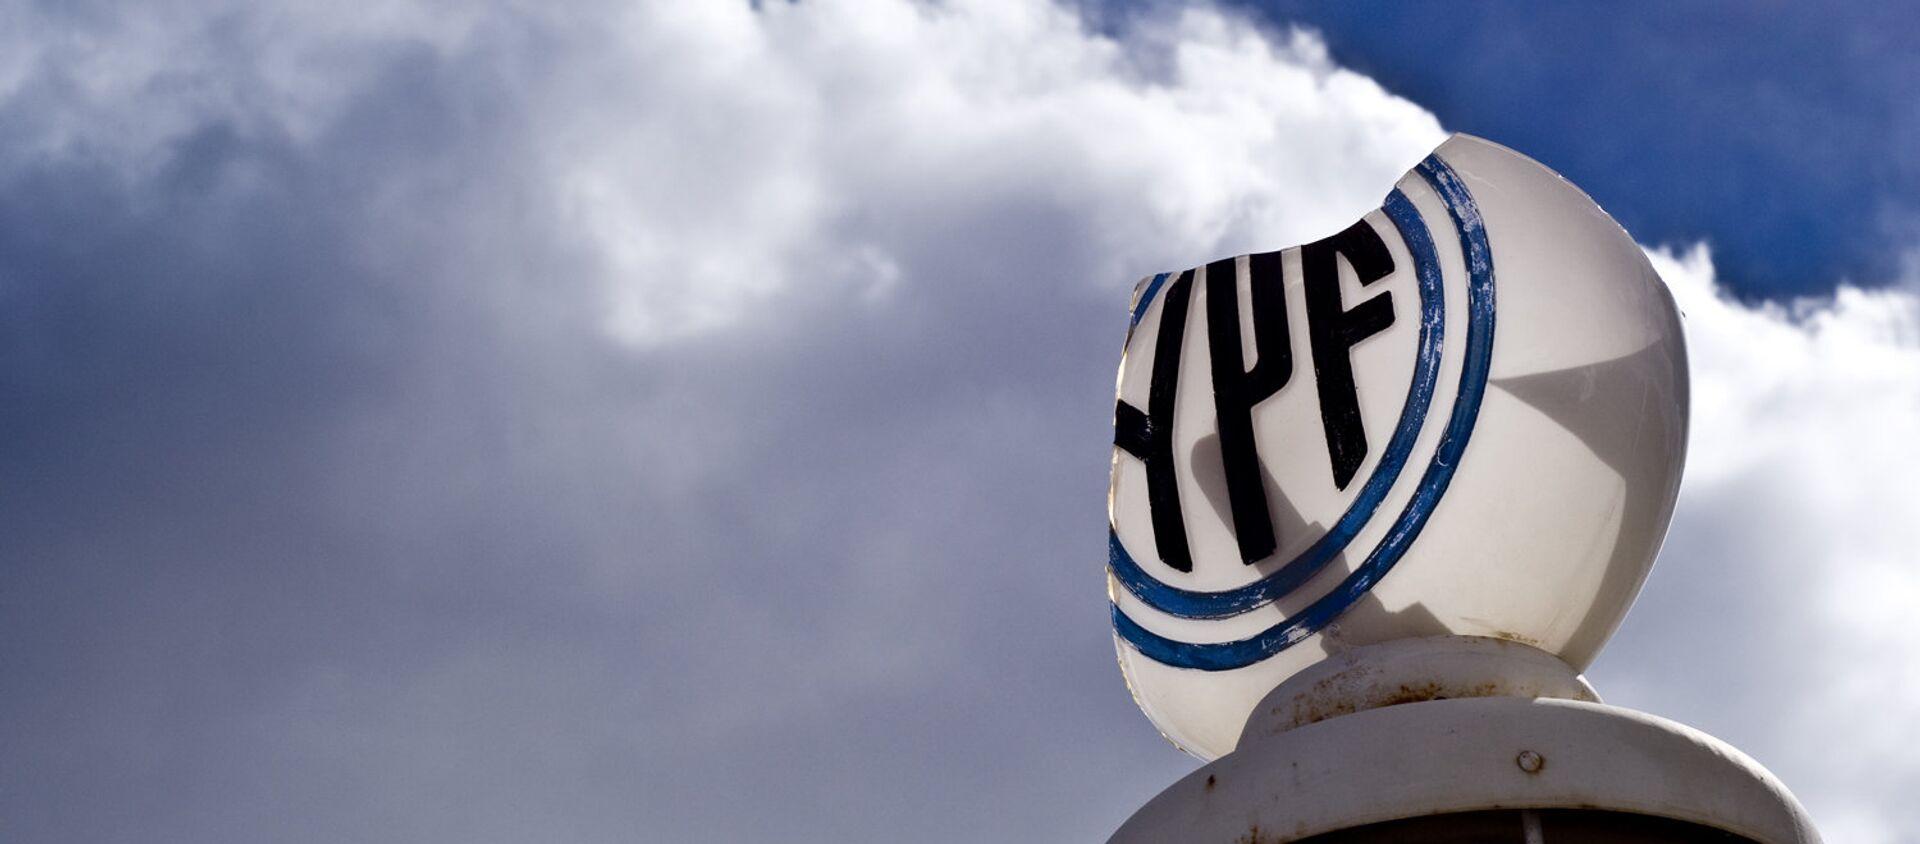 Logo de la petrolera argentina YPF - Sputnik Mundo, 1920, 24.04.2020